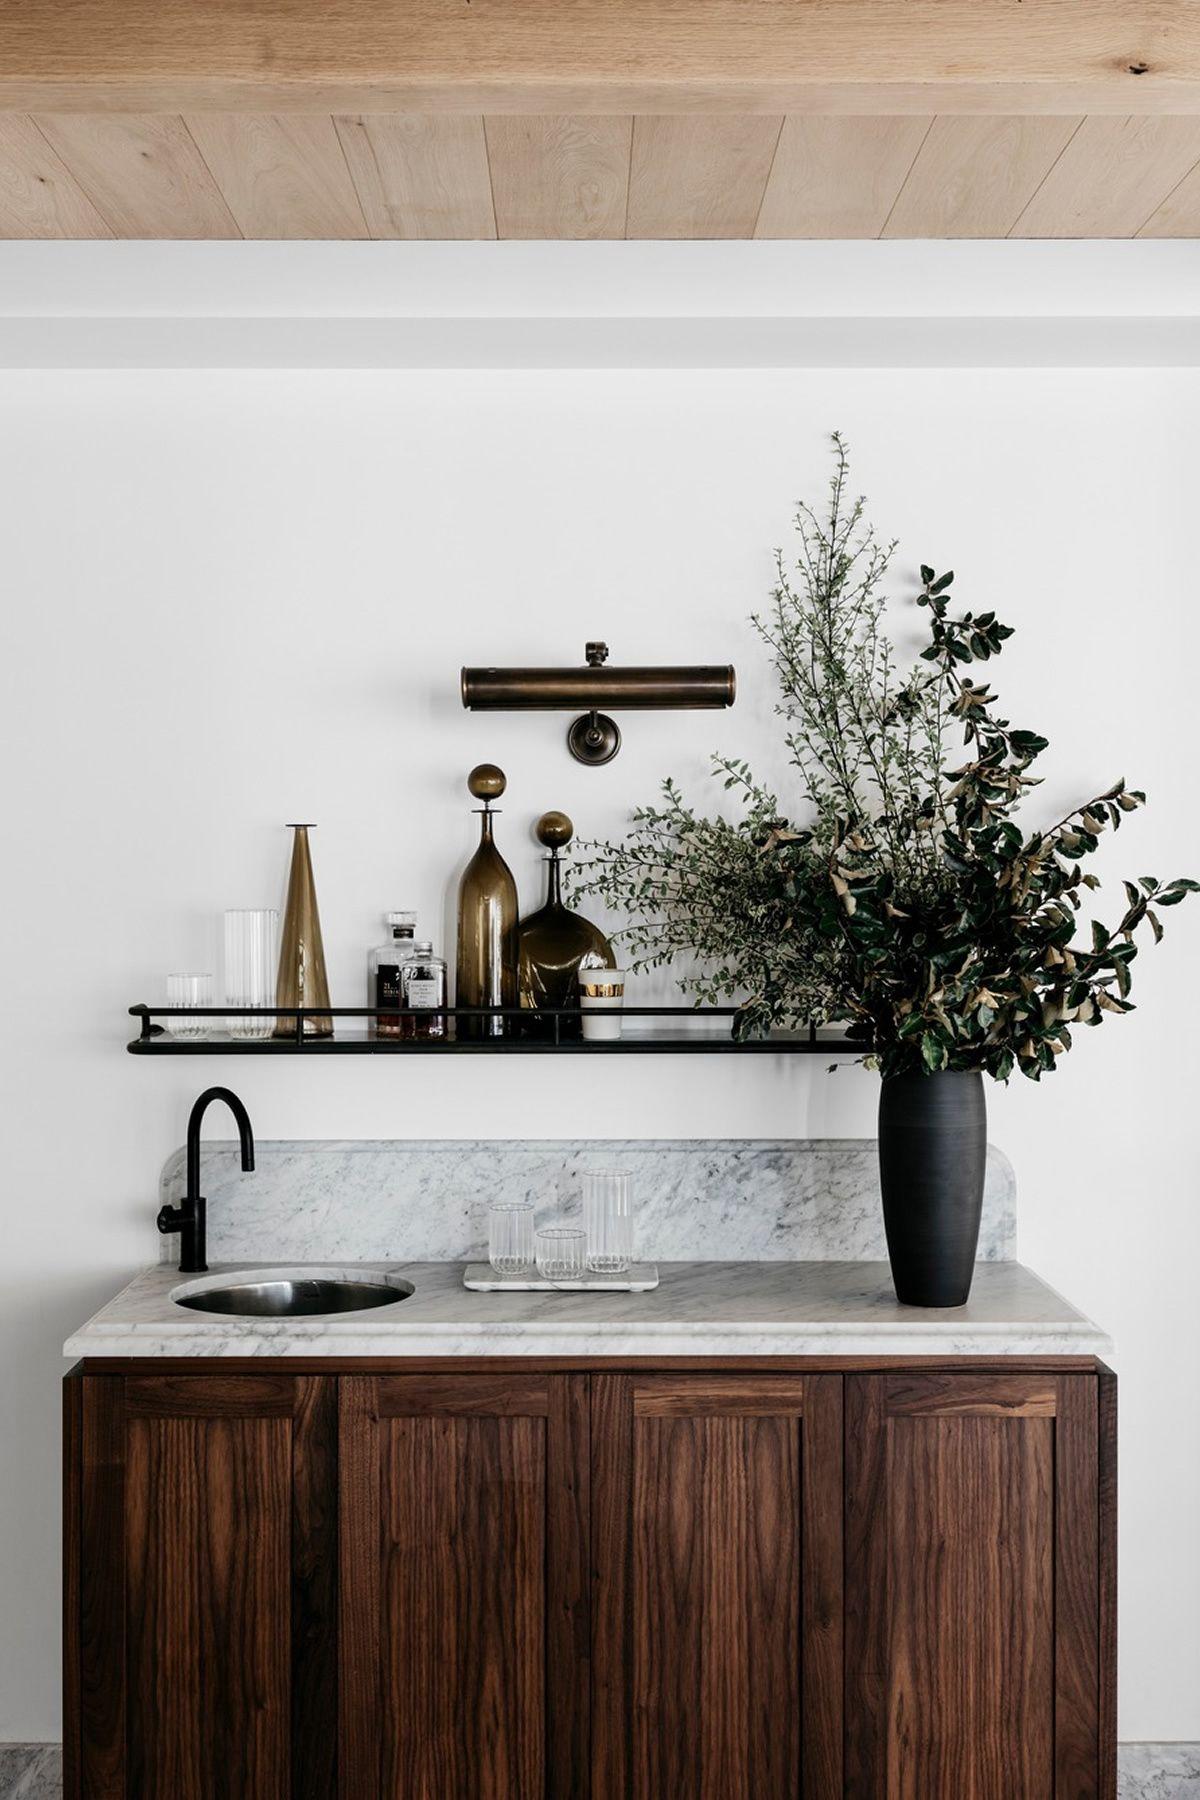 Pin by Jessica Goodman on Beautiful Homes & Portraits | Pinterest ...